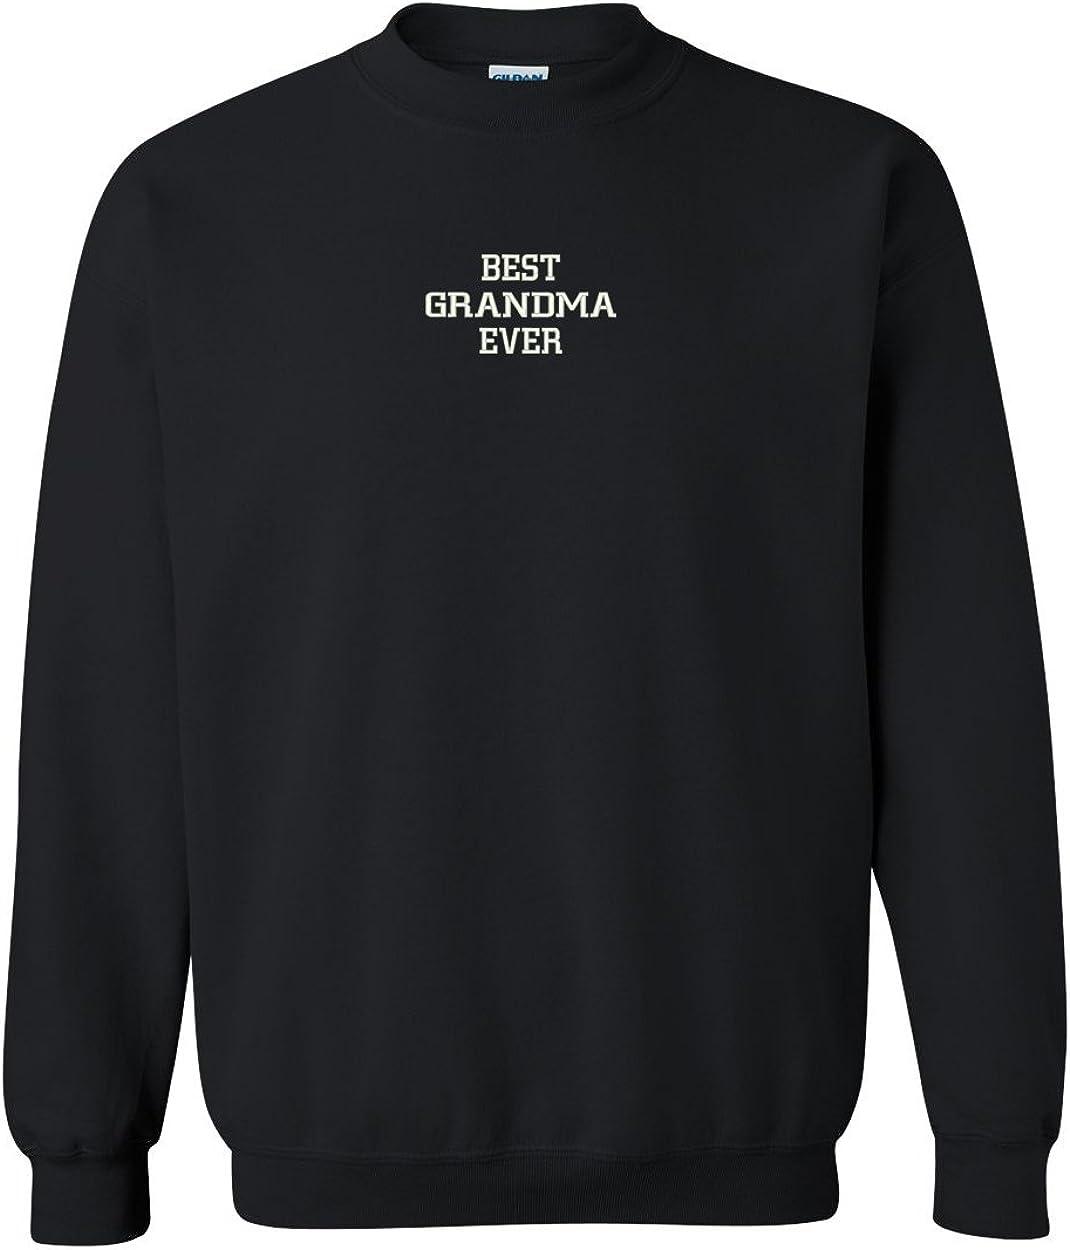 Trendy Apparel Shop Best Grandma Ever Embroidered Crewneck Sweatshirt